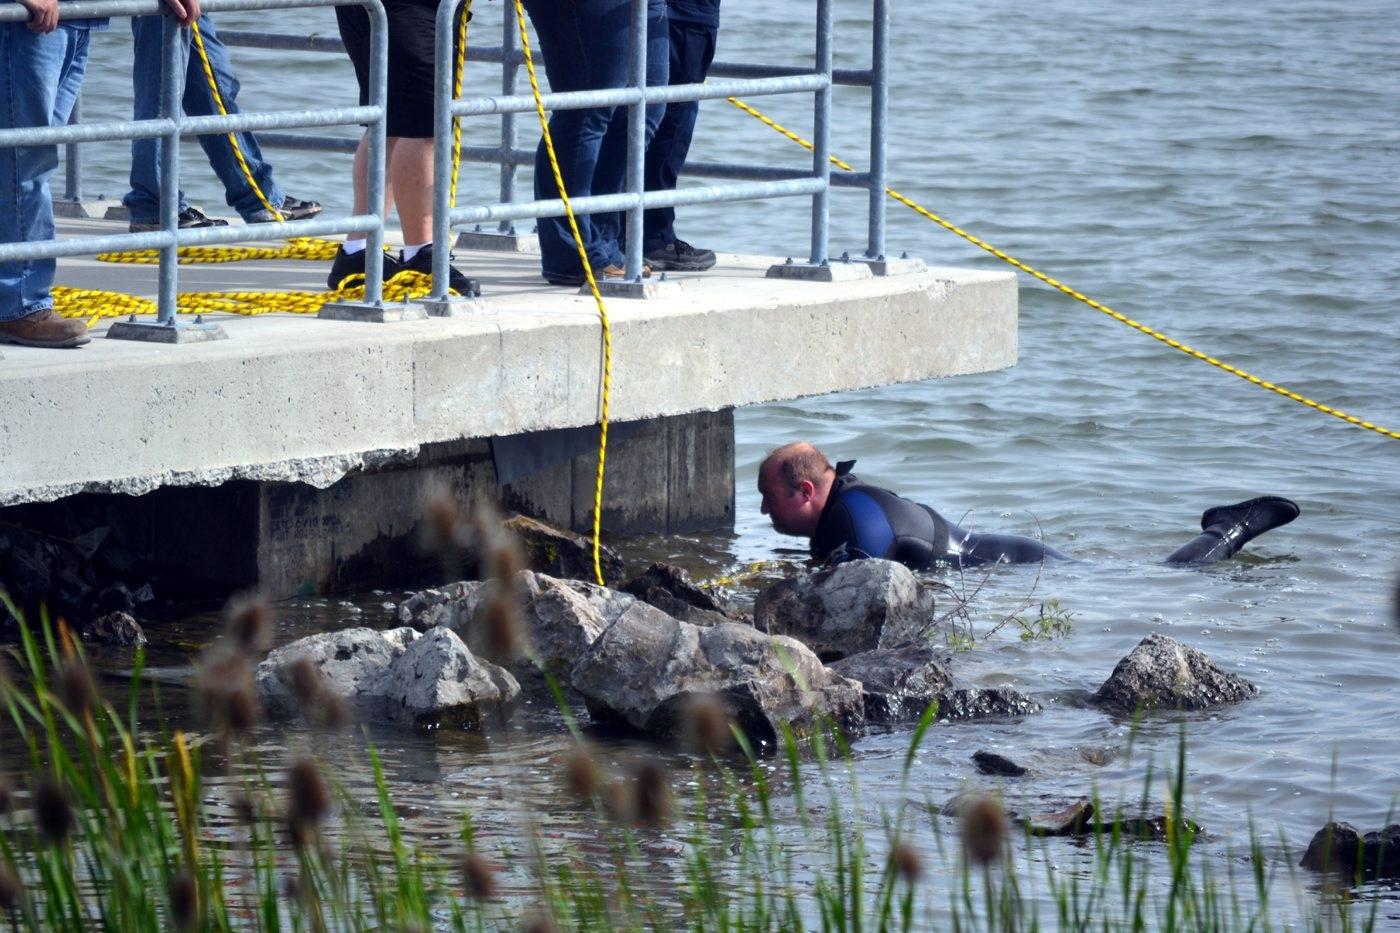 A dive team searches Gratwick Park in North Tonawanda for human remains June 29. (Larry Kensinger/Contributor)